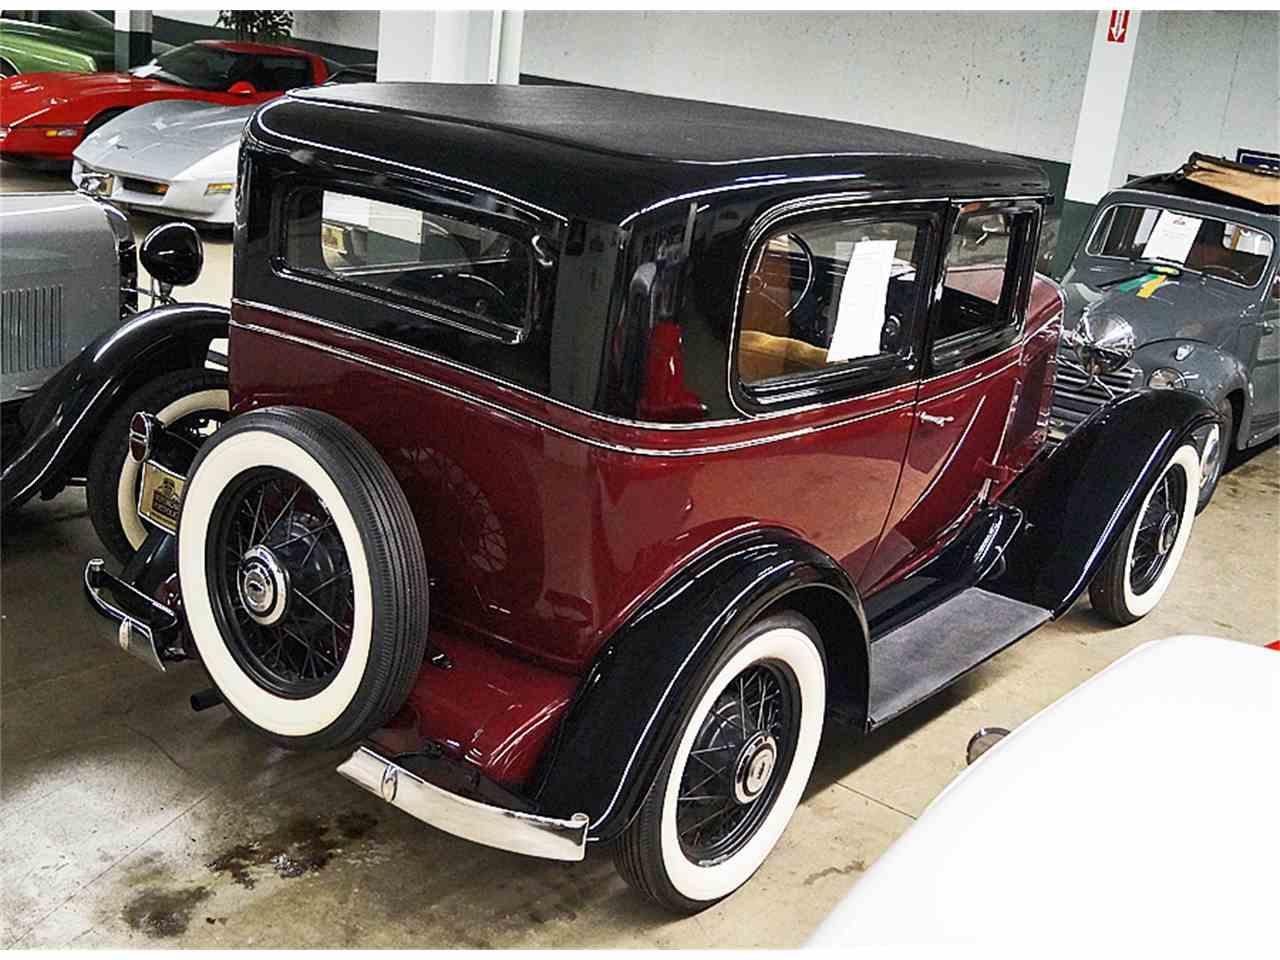 Sedan 1931 chevrolet sedan for sale : 1931 Chevrolet AE Independence for Sale | ClassicCars.com | CC-882445